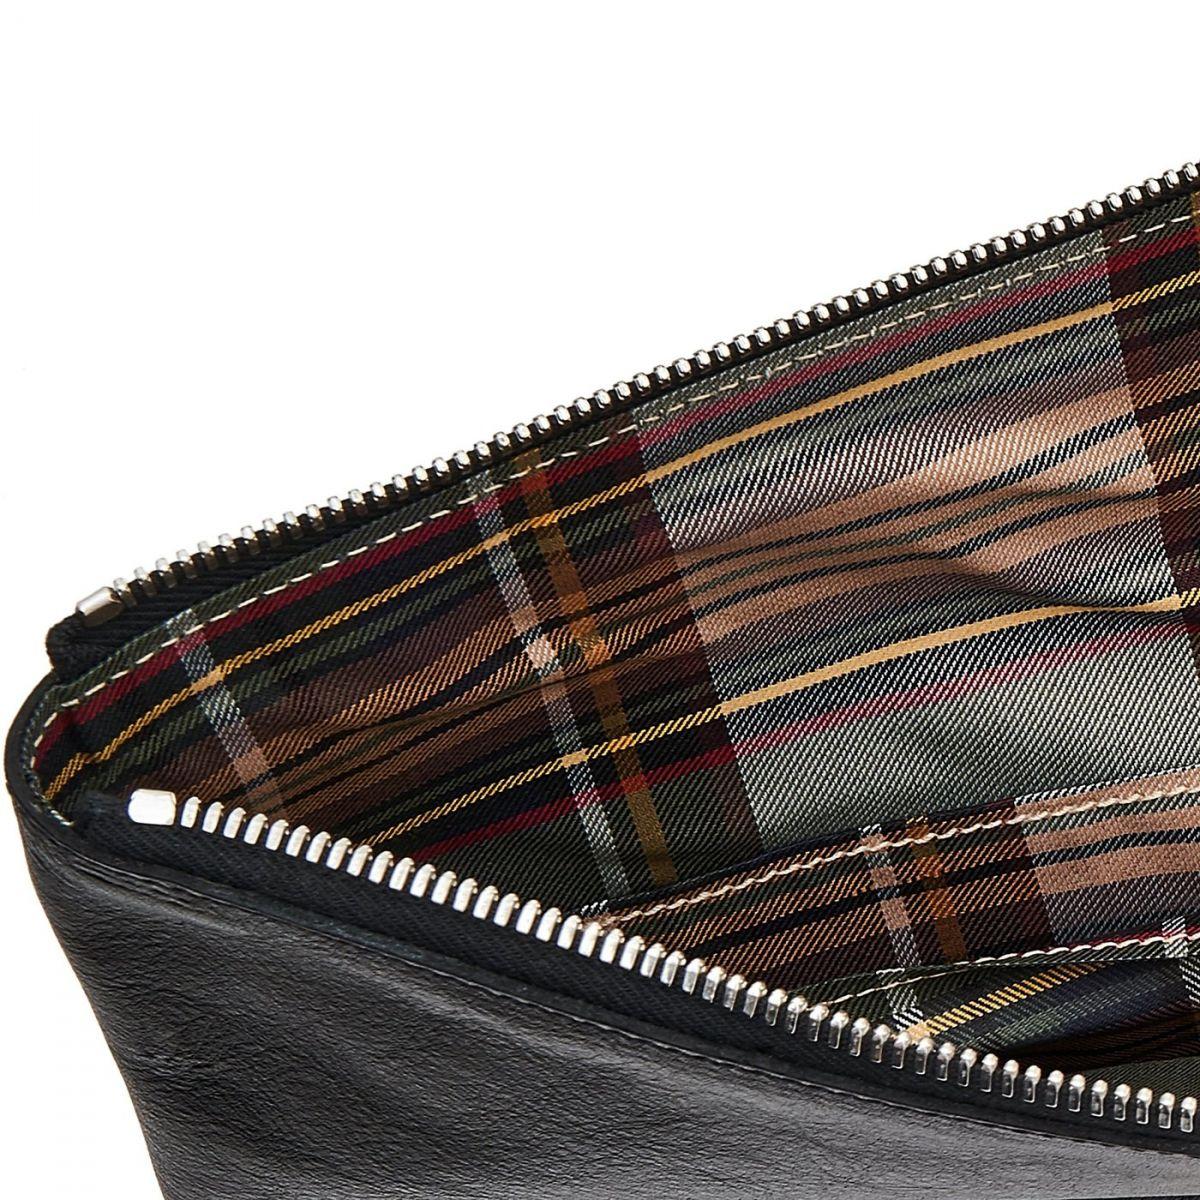 Portfolio in Cowhide Double Leather color Black - OSL002 | Details